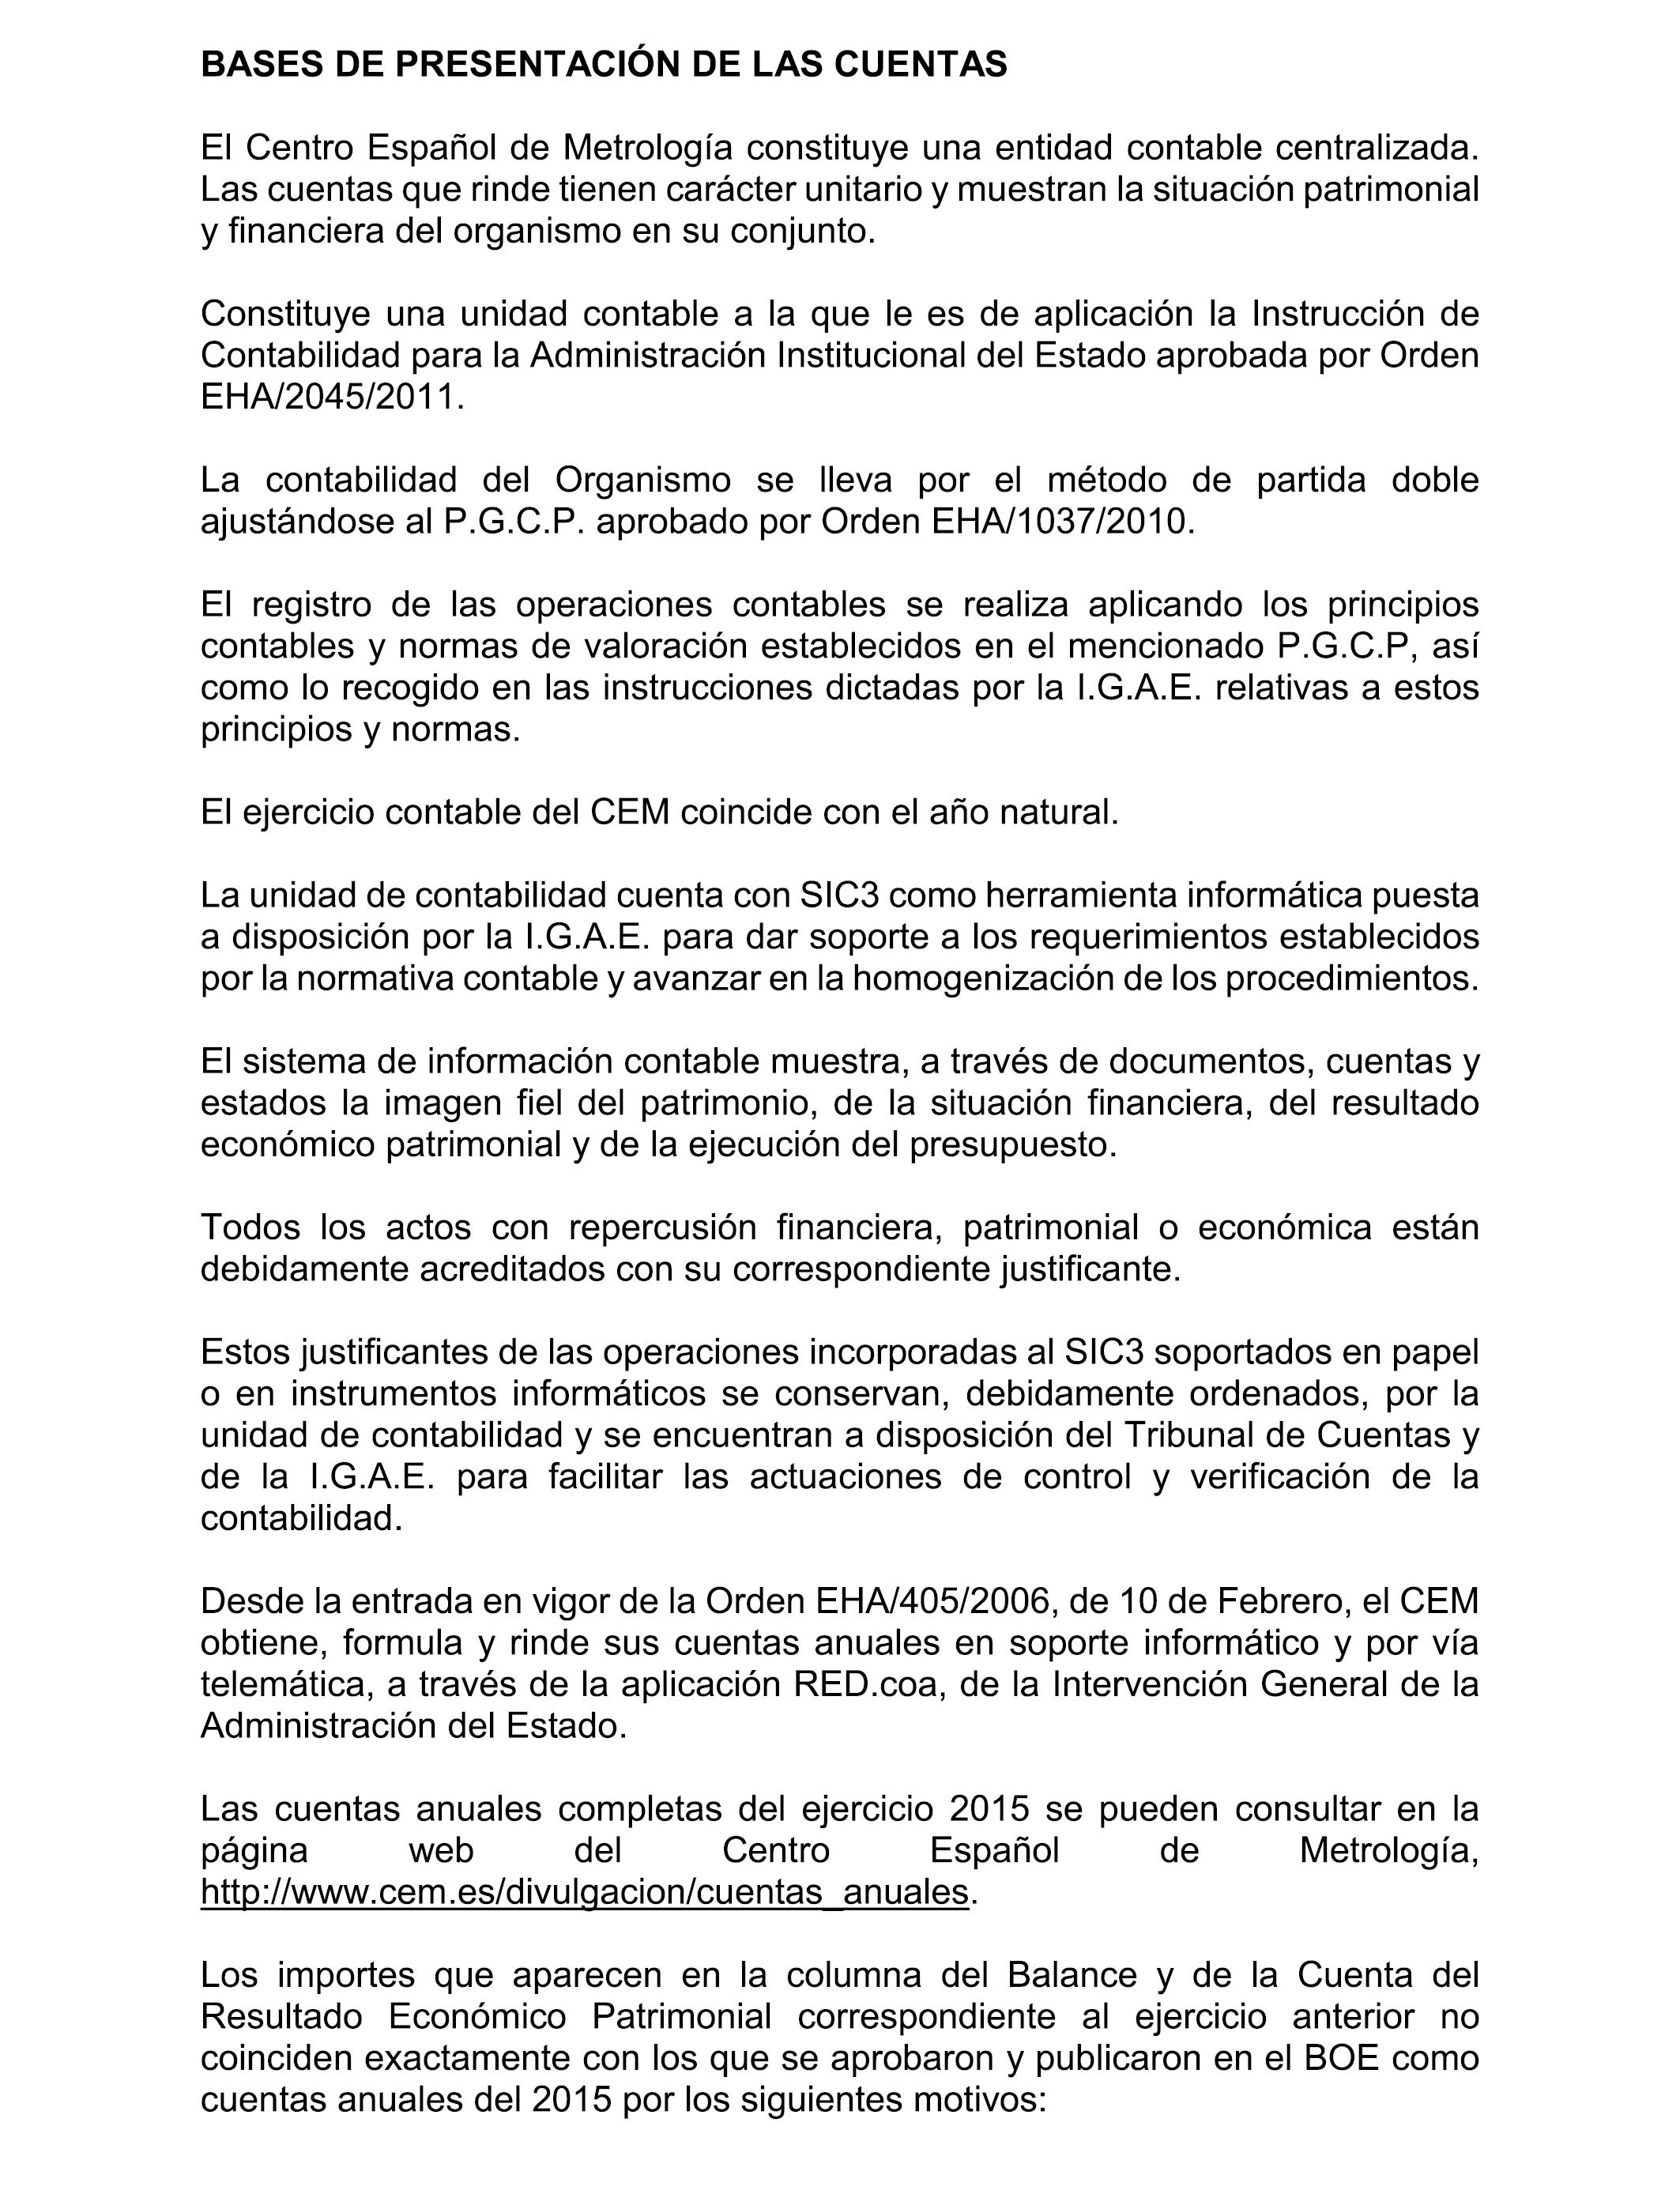 BOE.es - Documento BOE-A-2017-10605